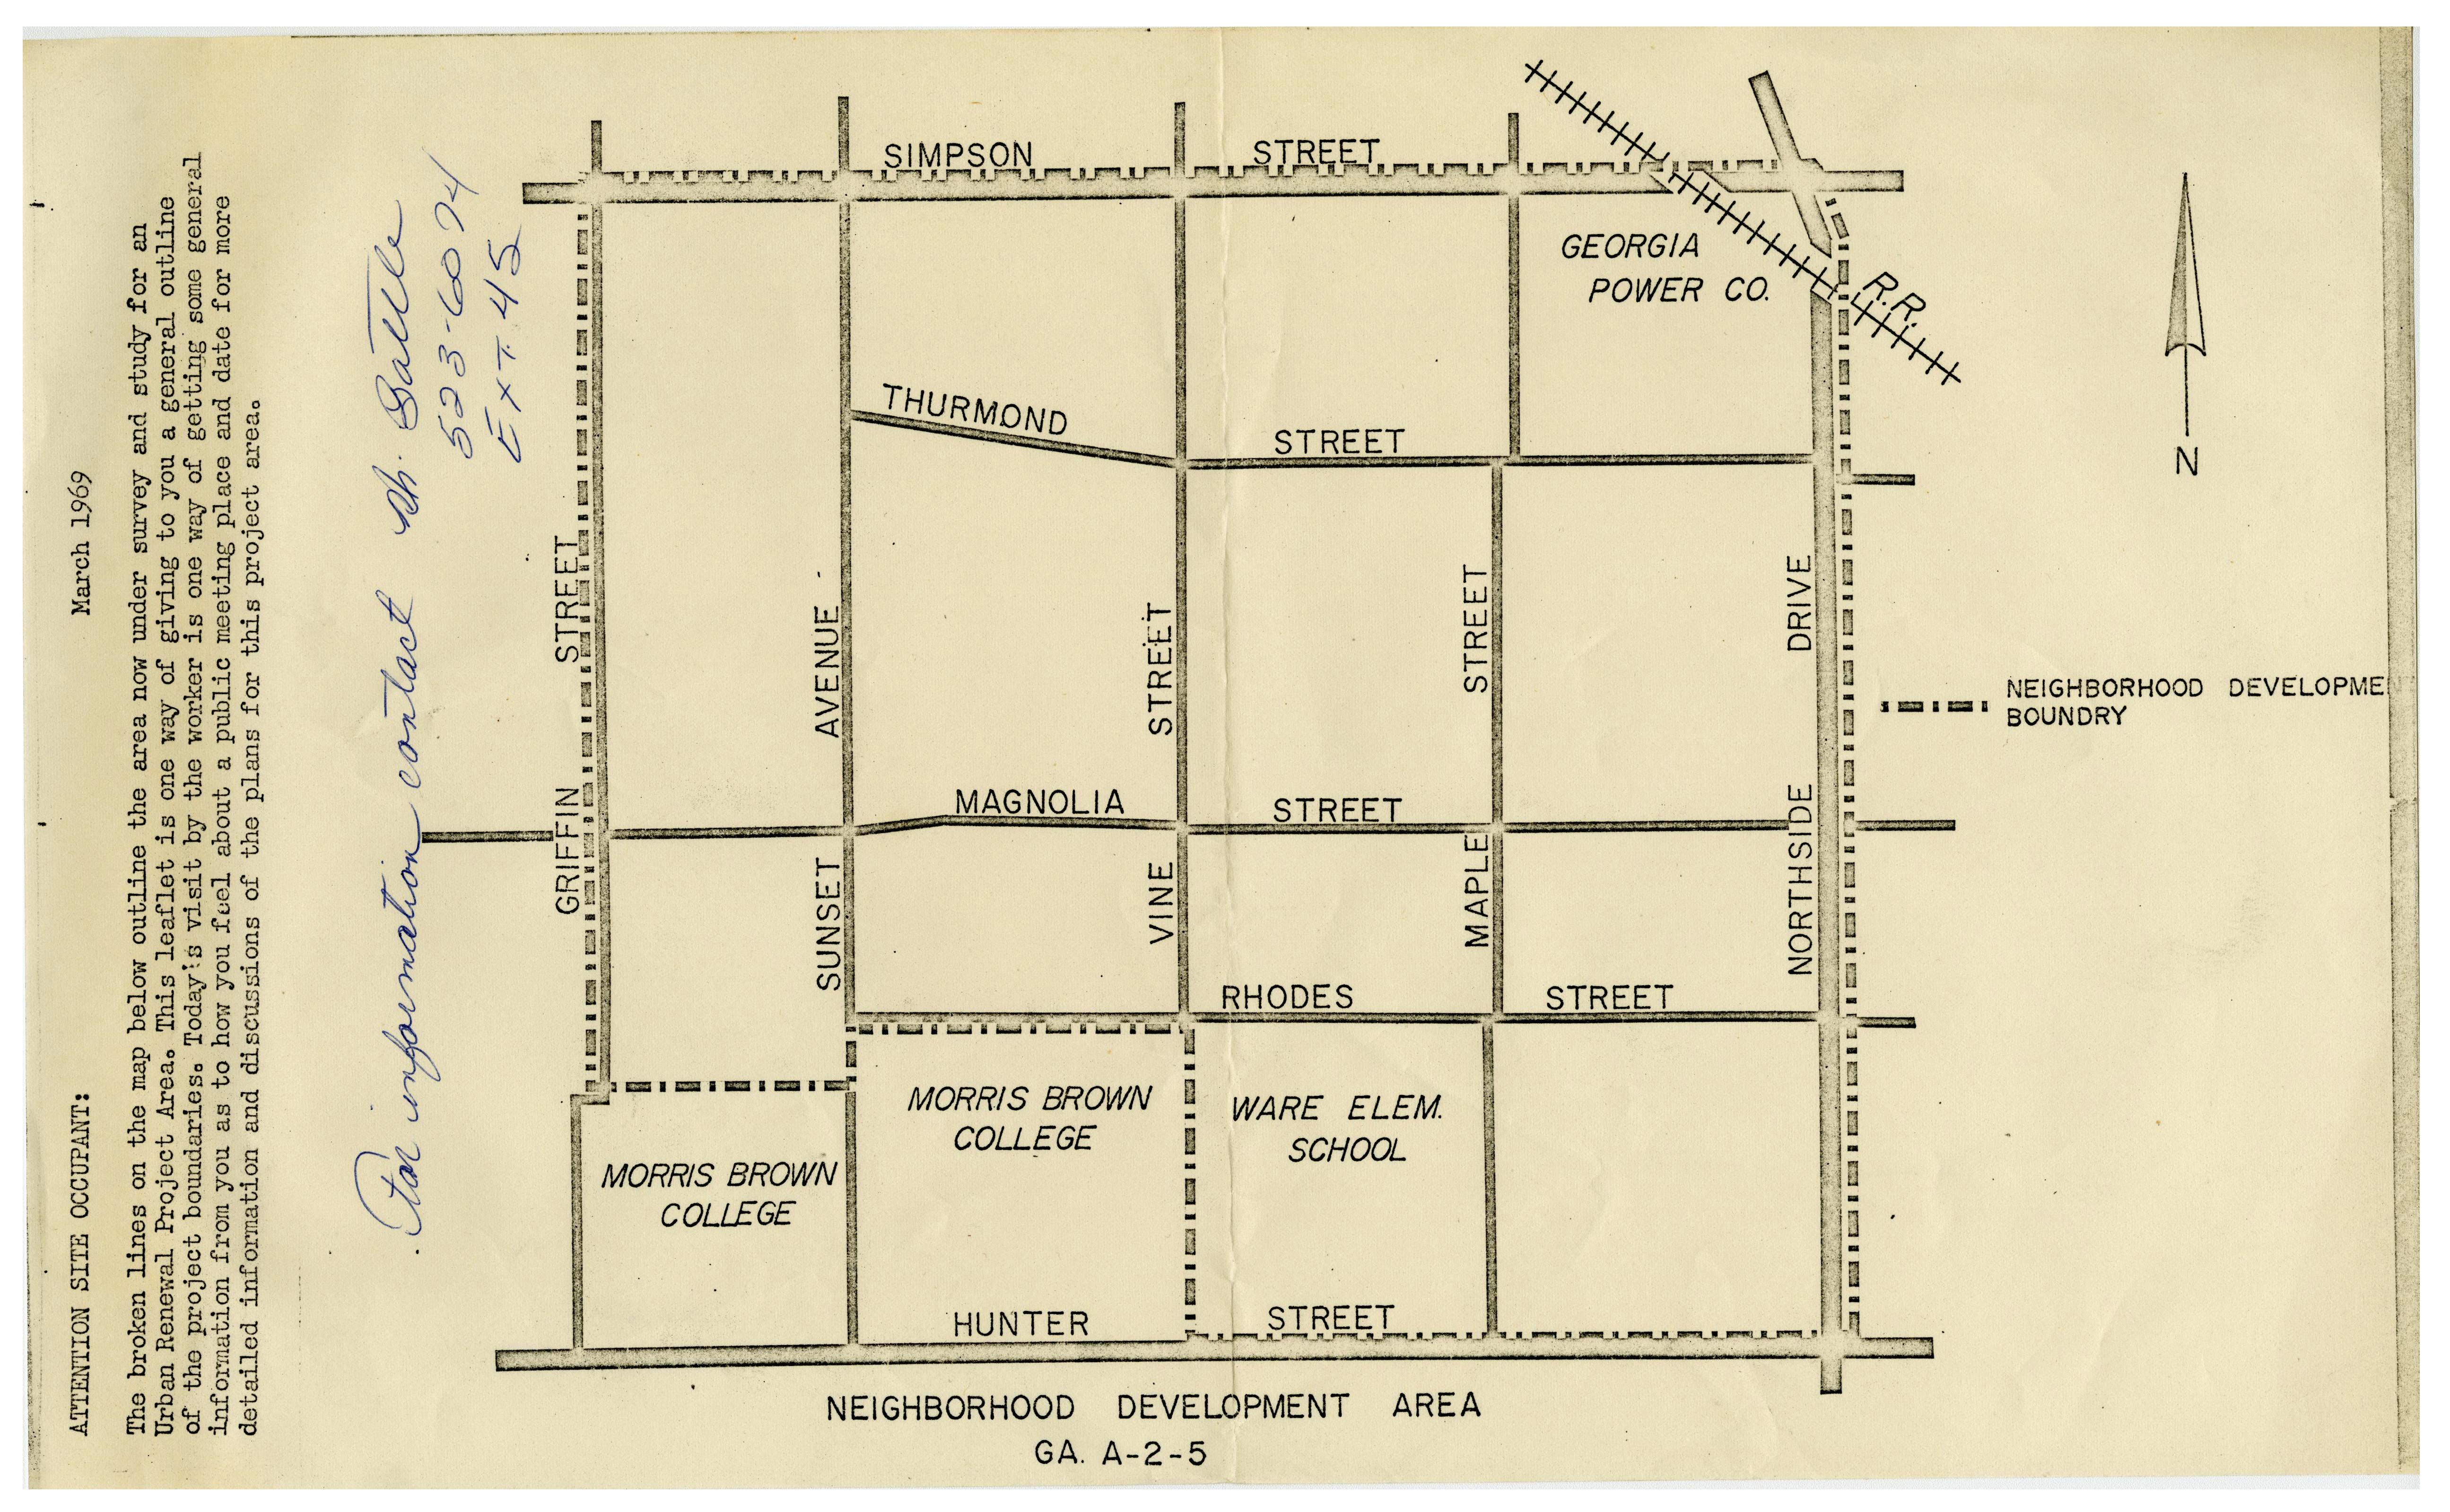 Neighborhood Development Area